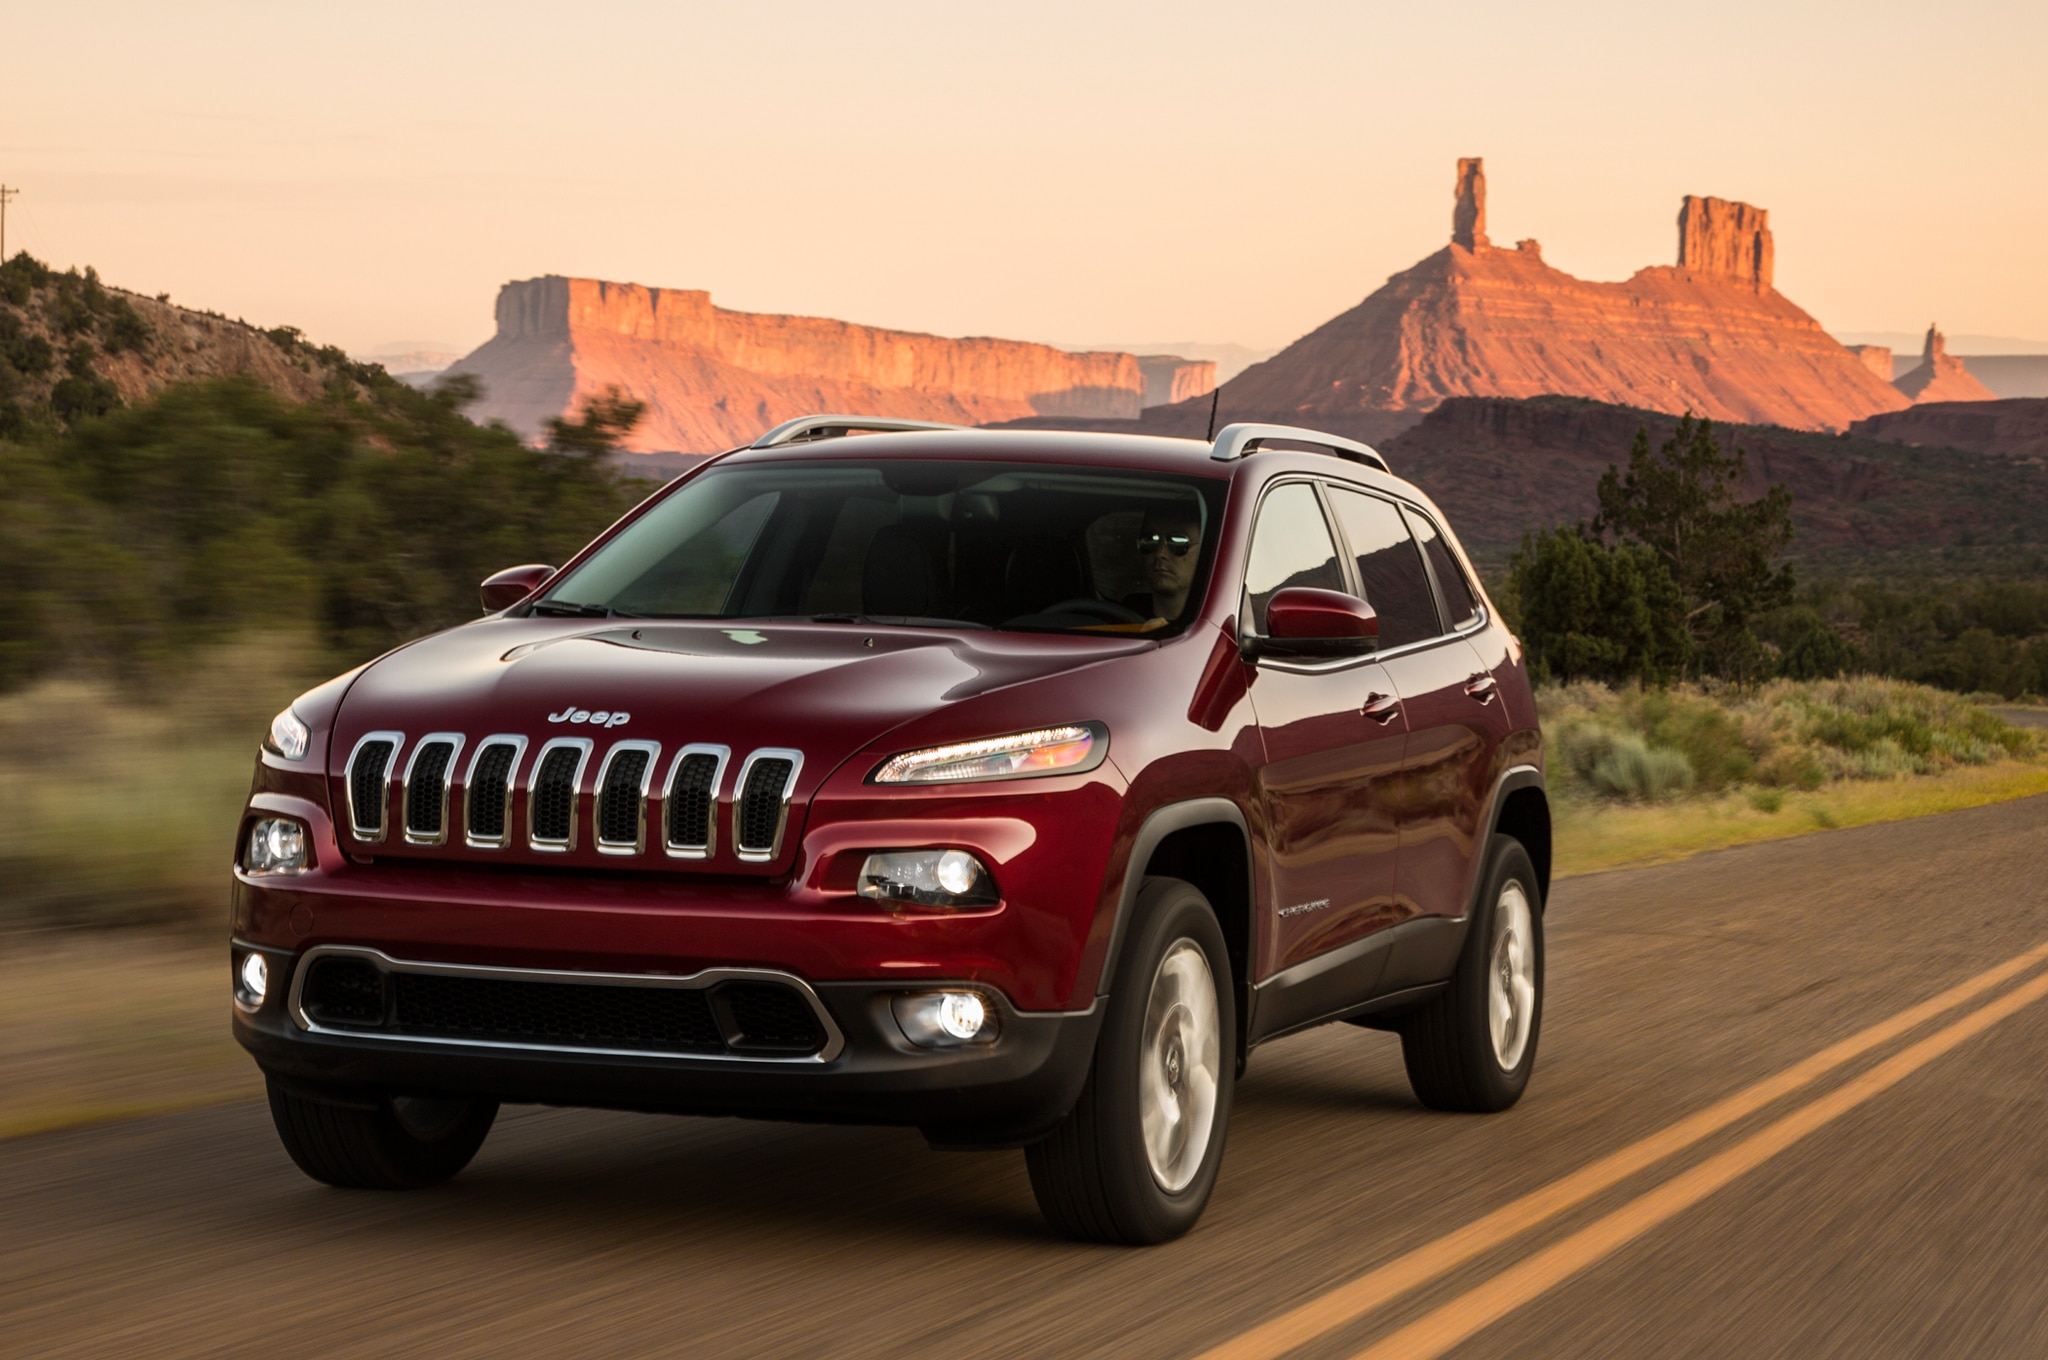 2014 Jeep Cherokee: Around The Block